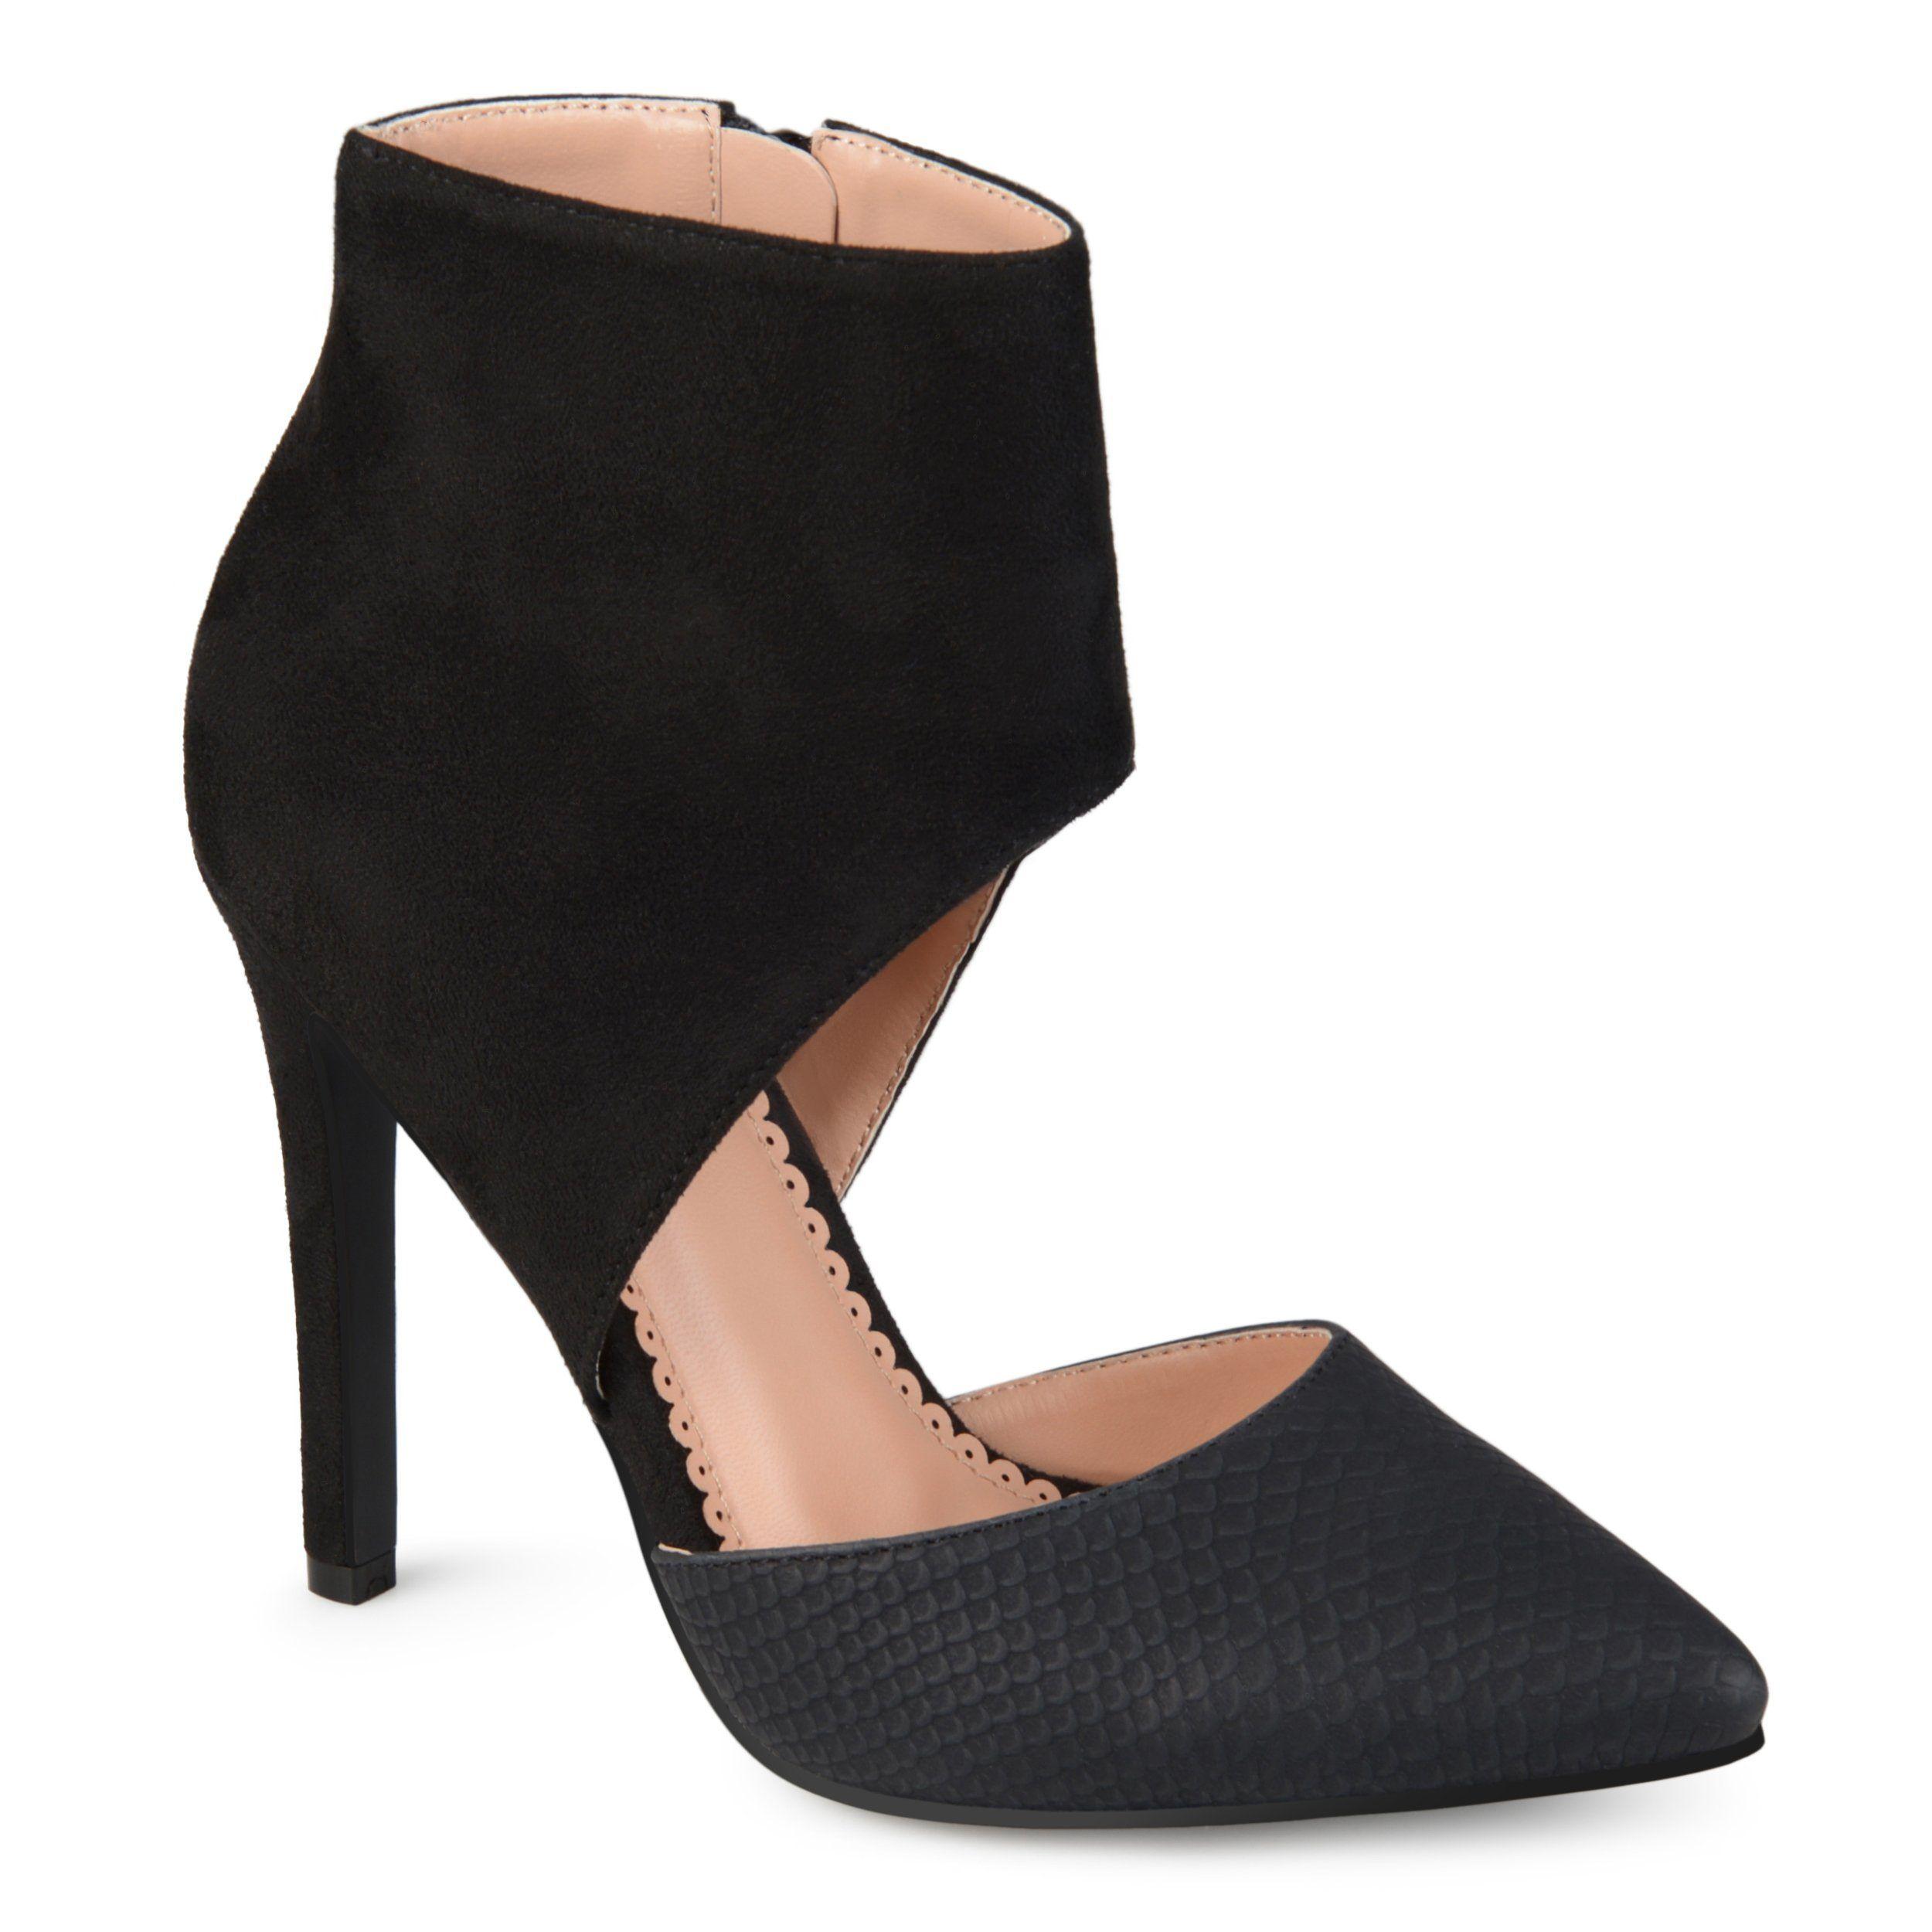 Details about  /Fashion Multi-Color Women/'s High Top High Heel Stilleto Sneaker Sport Shoe SZ